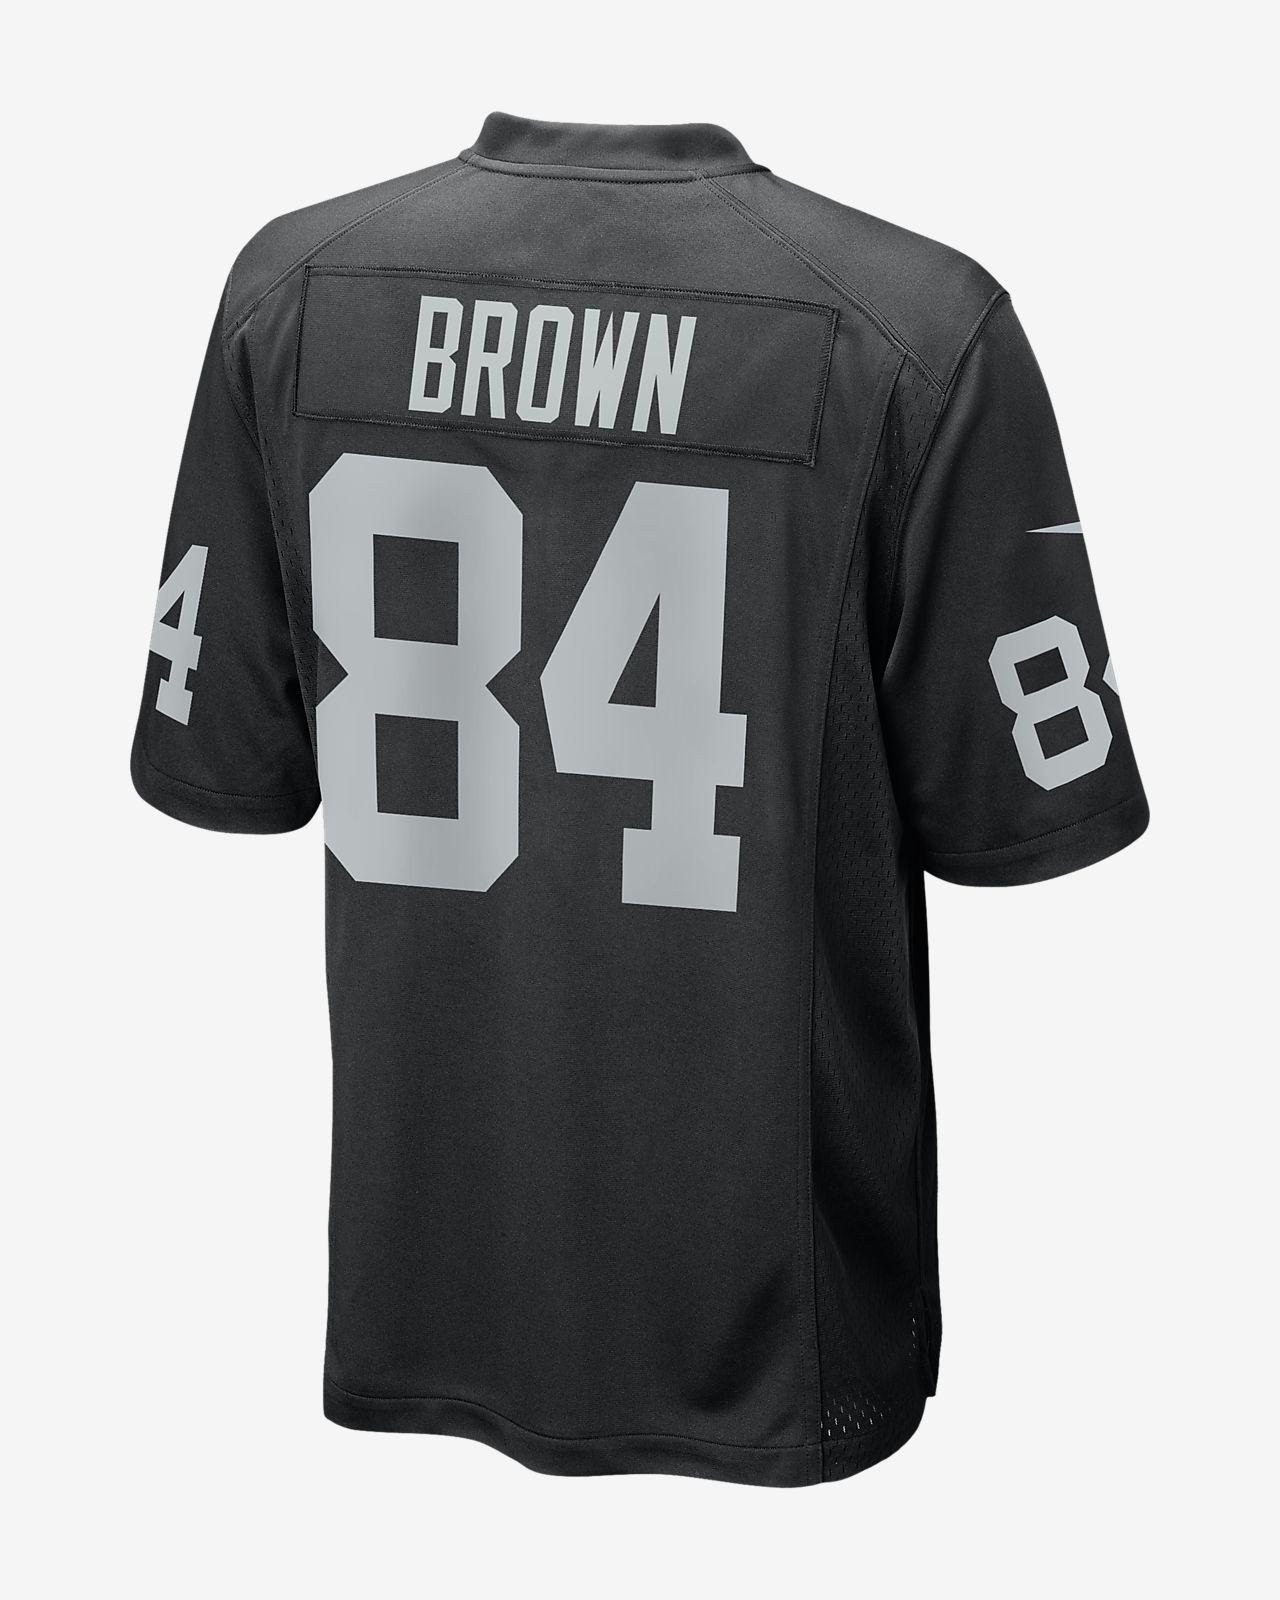 733cf8755 NFL Oakland Raiders (Antonio Brown) Men s Game Football Jersey. Nike.com